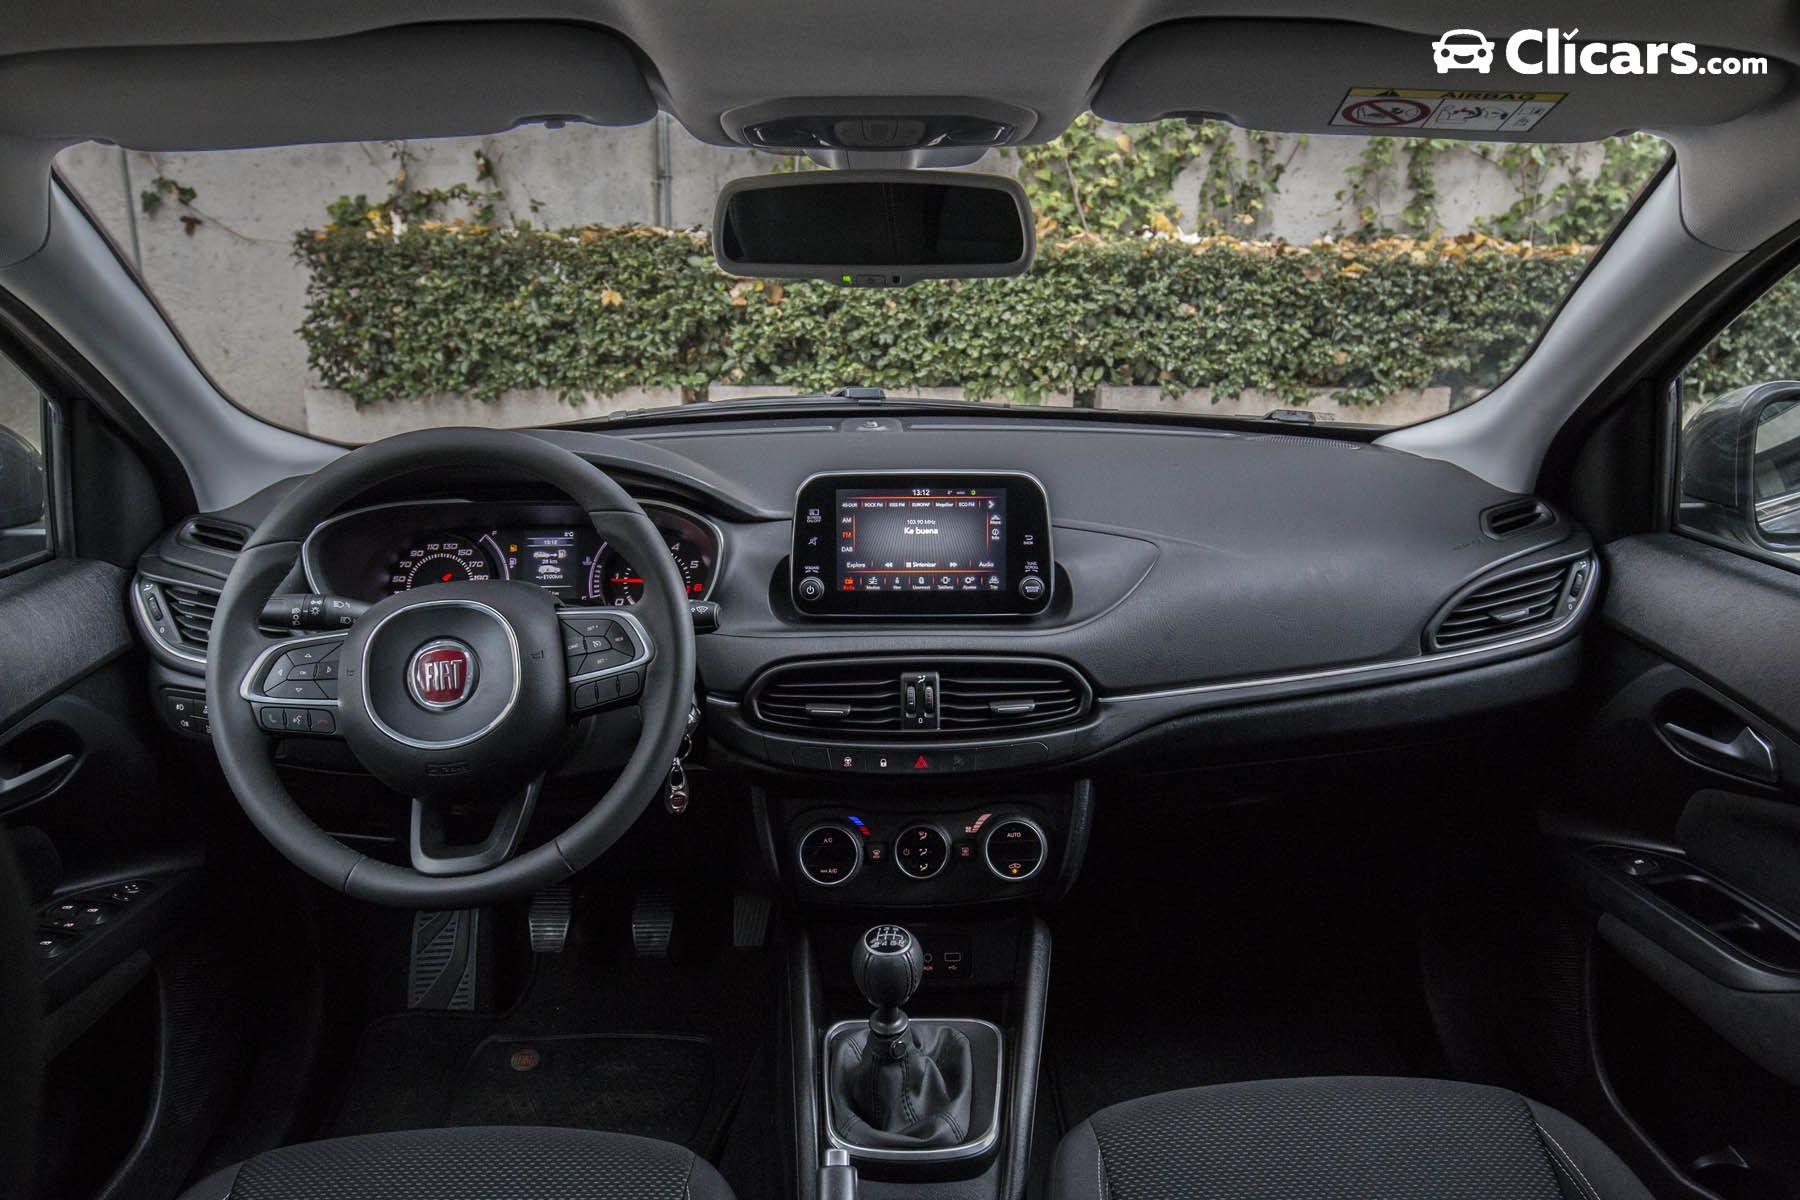 Fiat Tipo fire 1.4 95cv (4p) (95cv) 2016 (Gasolina) -  #Motor #Carroceria #Drive #Road #Fast #Driving #Car #Auto #Coche #Conducir #Comprar #Vender #Clicars #BuenaMano #Certificación #Vehicle #Vehículo #Automotive #Automóvil #Equipamiento #Boot #2016 #Buy #Sell #Cars #Premium #Confort #fiat #tipo #fire